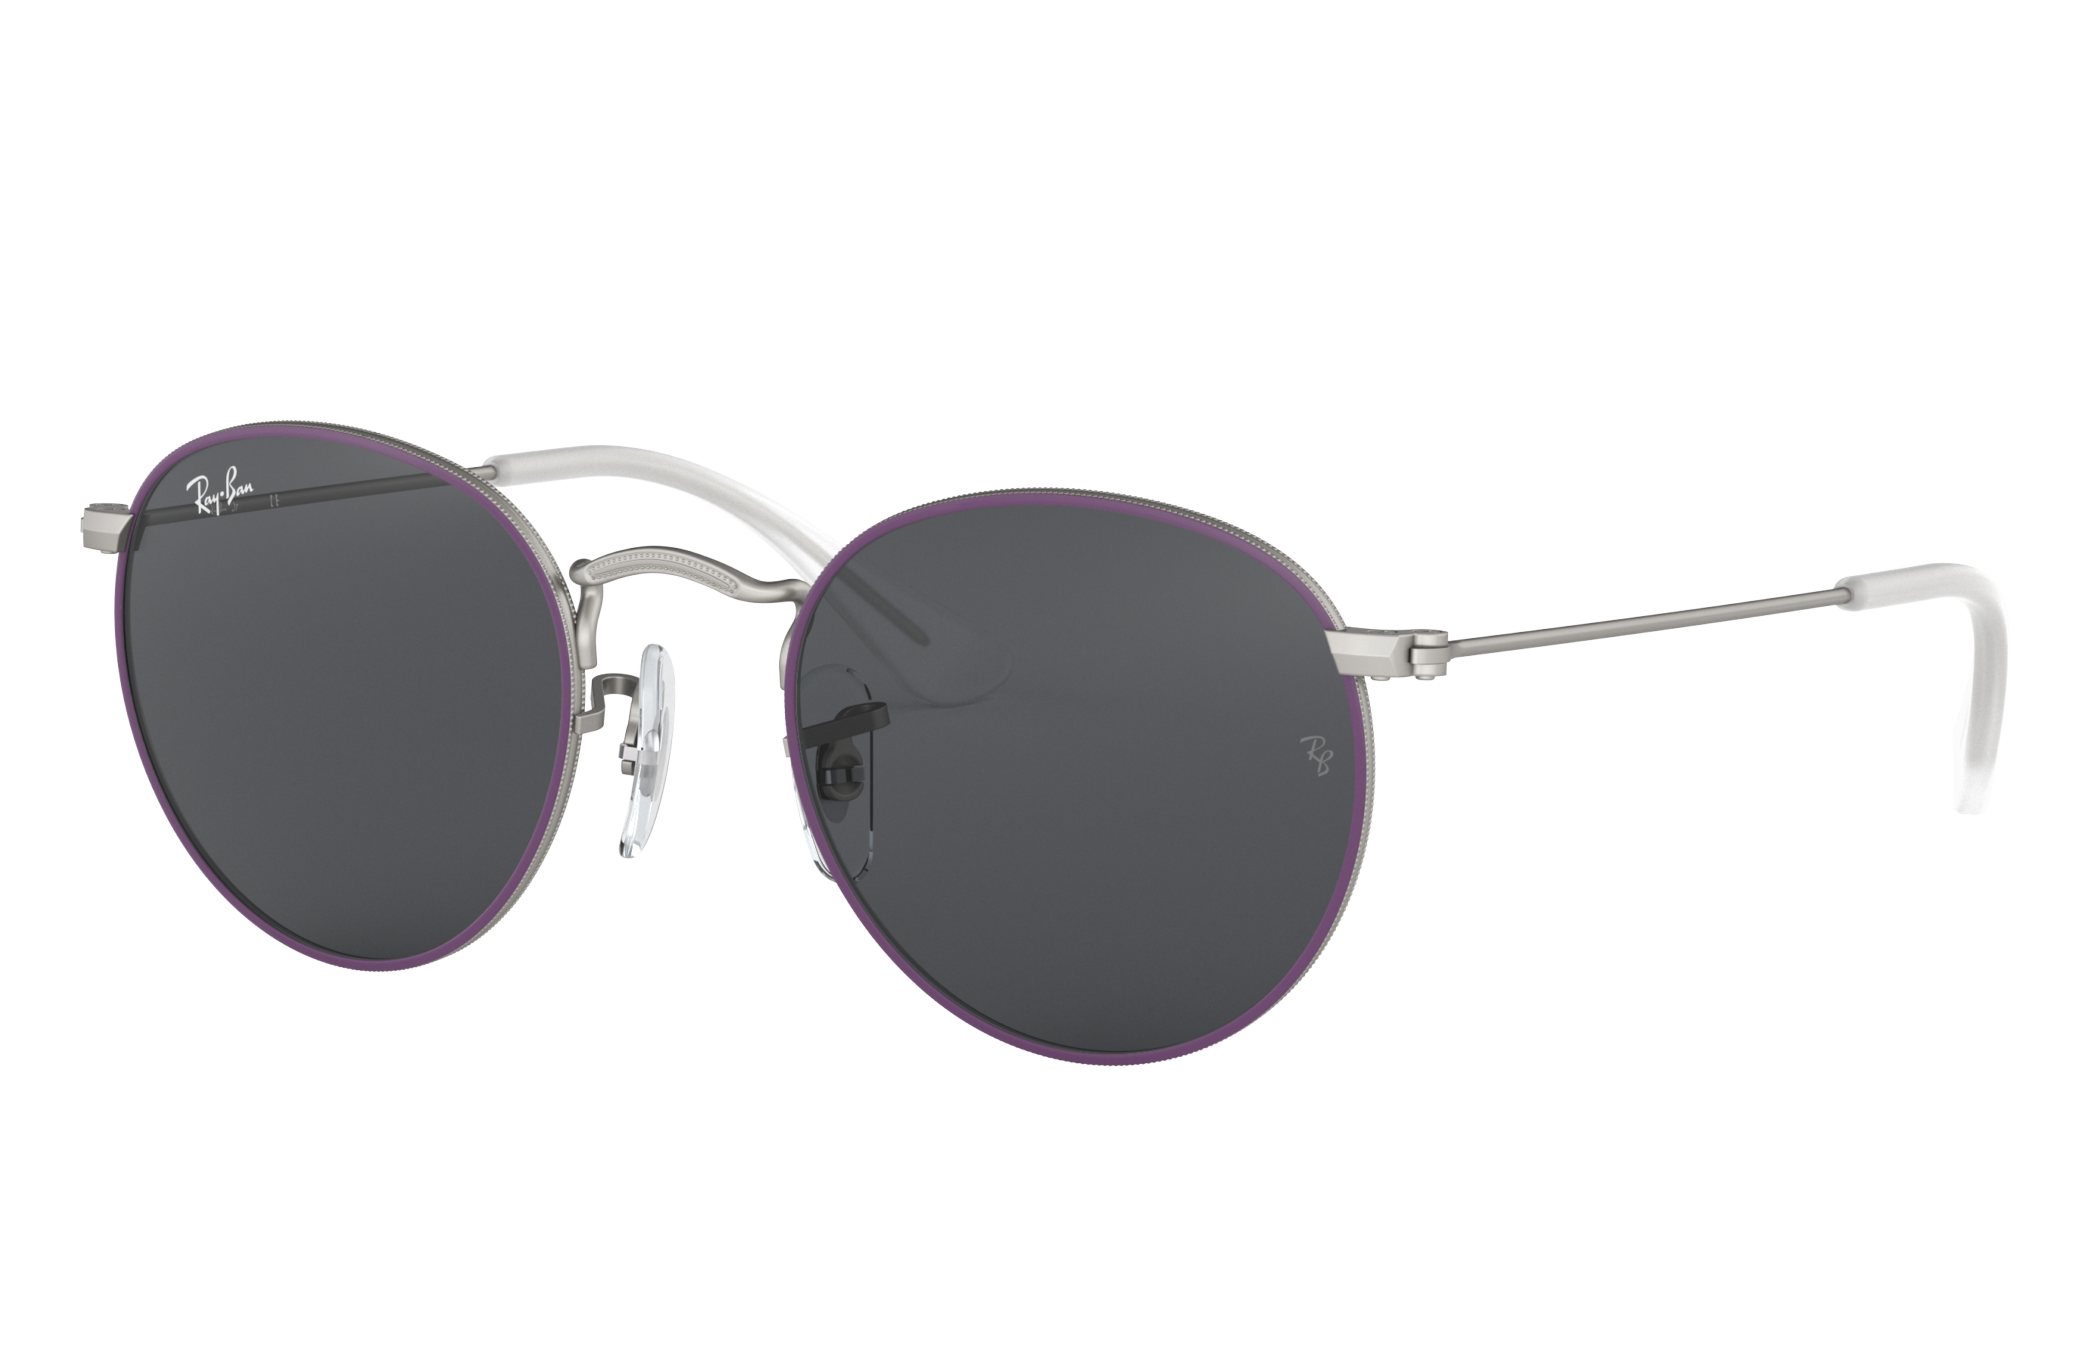 Ray-Ban Round Metal Junior Violet, Grey Lenses - RJ9547S